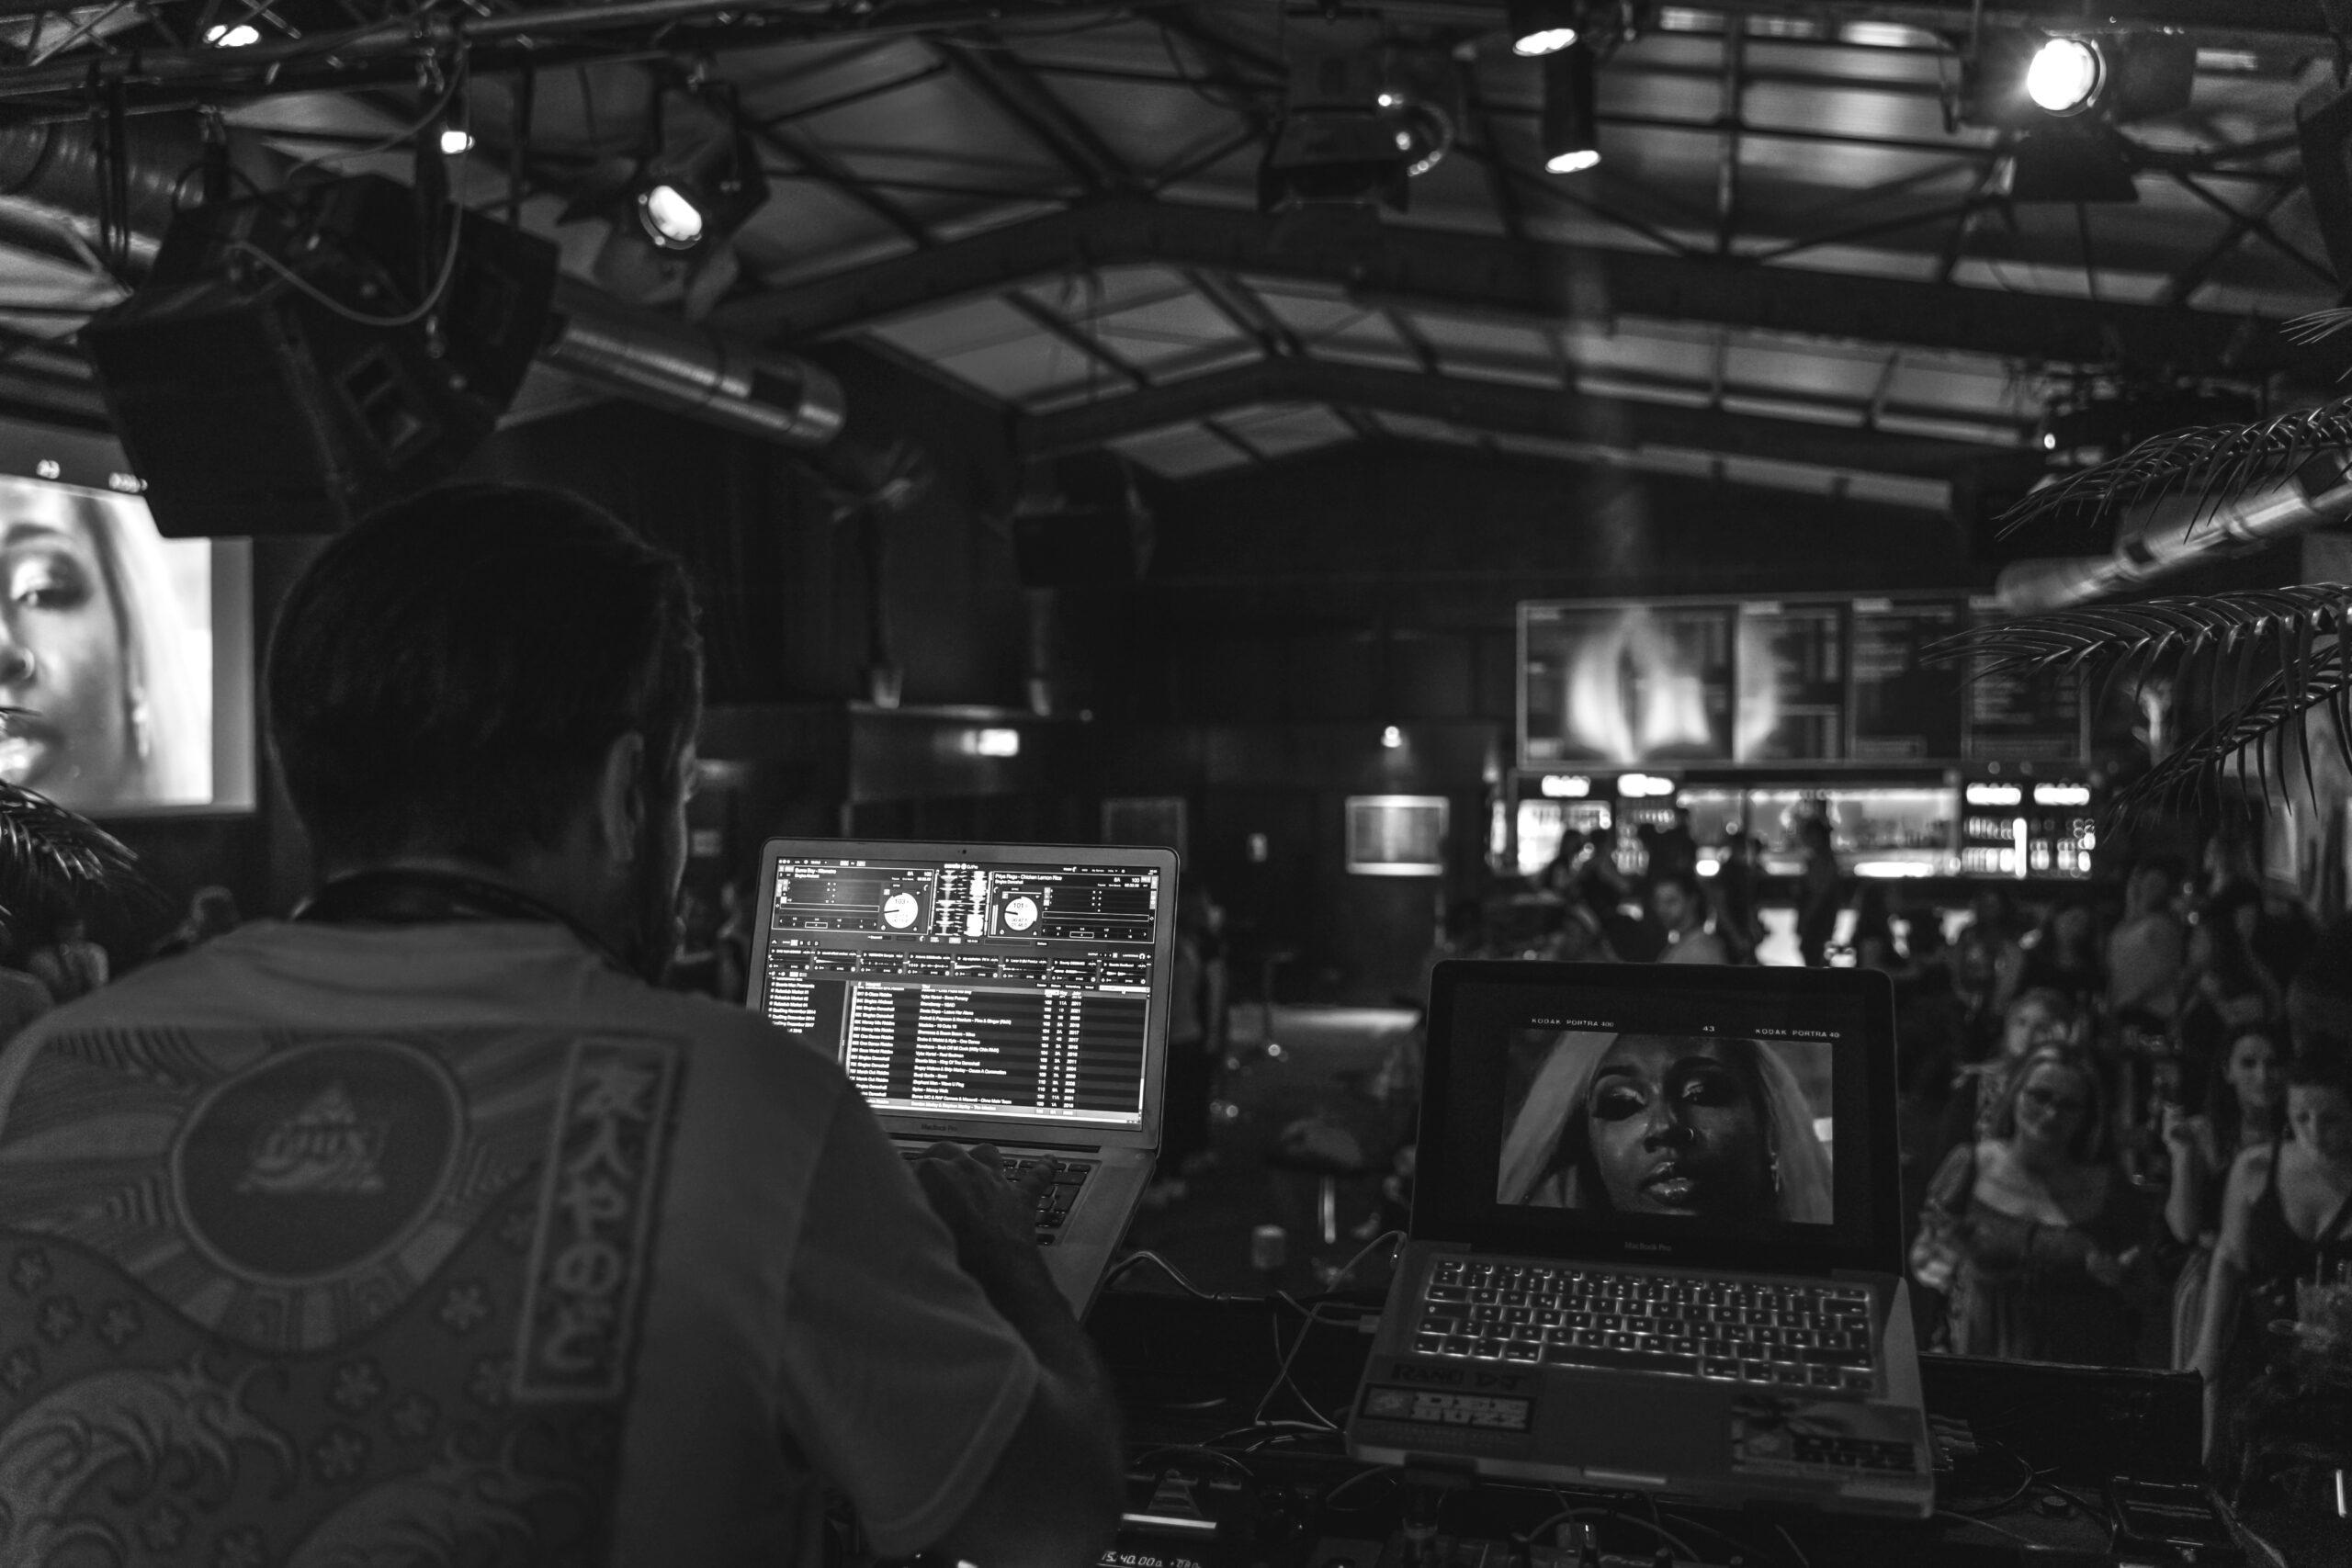 Deebuzz spielt neue Tracks im Rude7 Party Club Mannheim